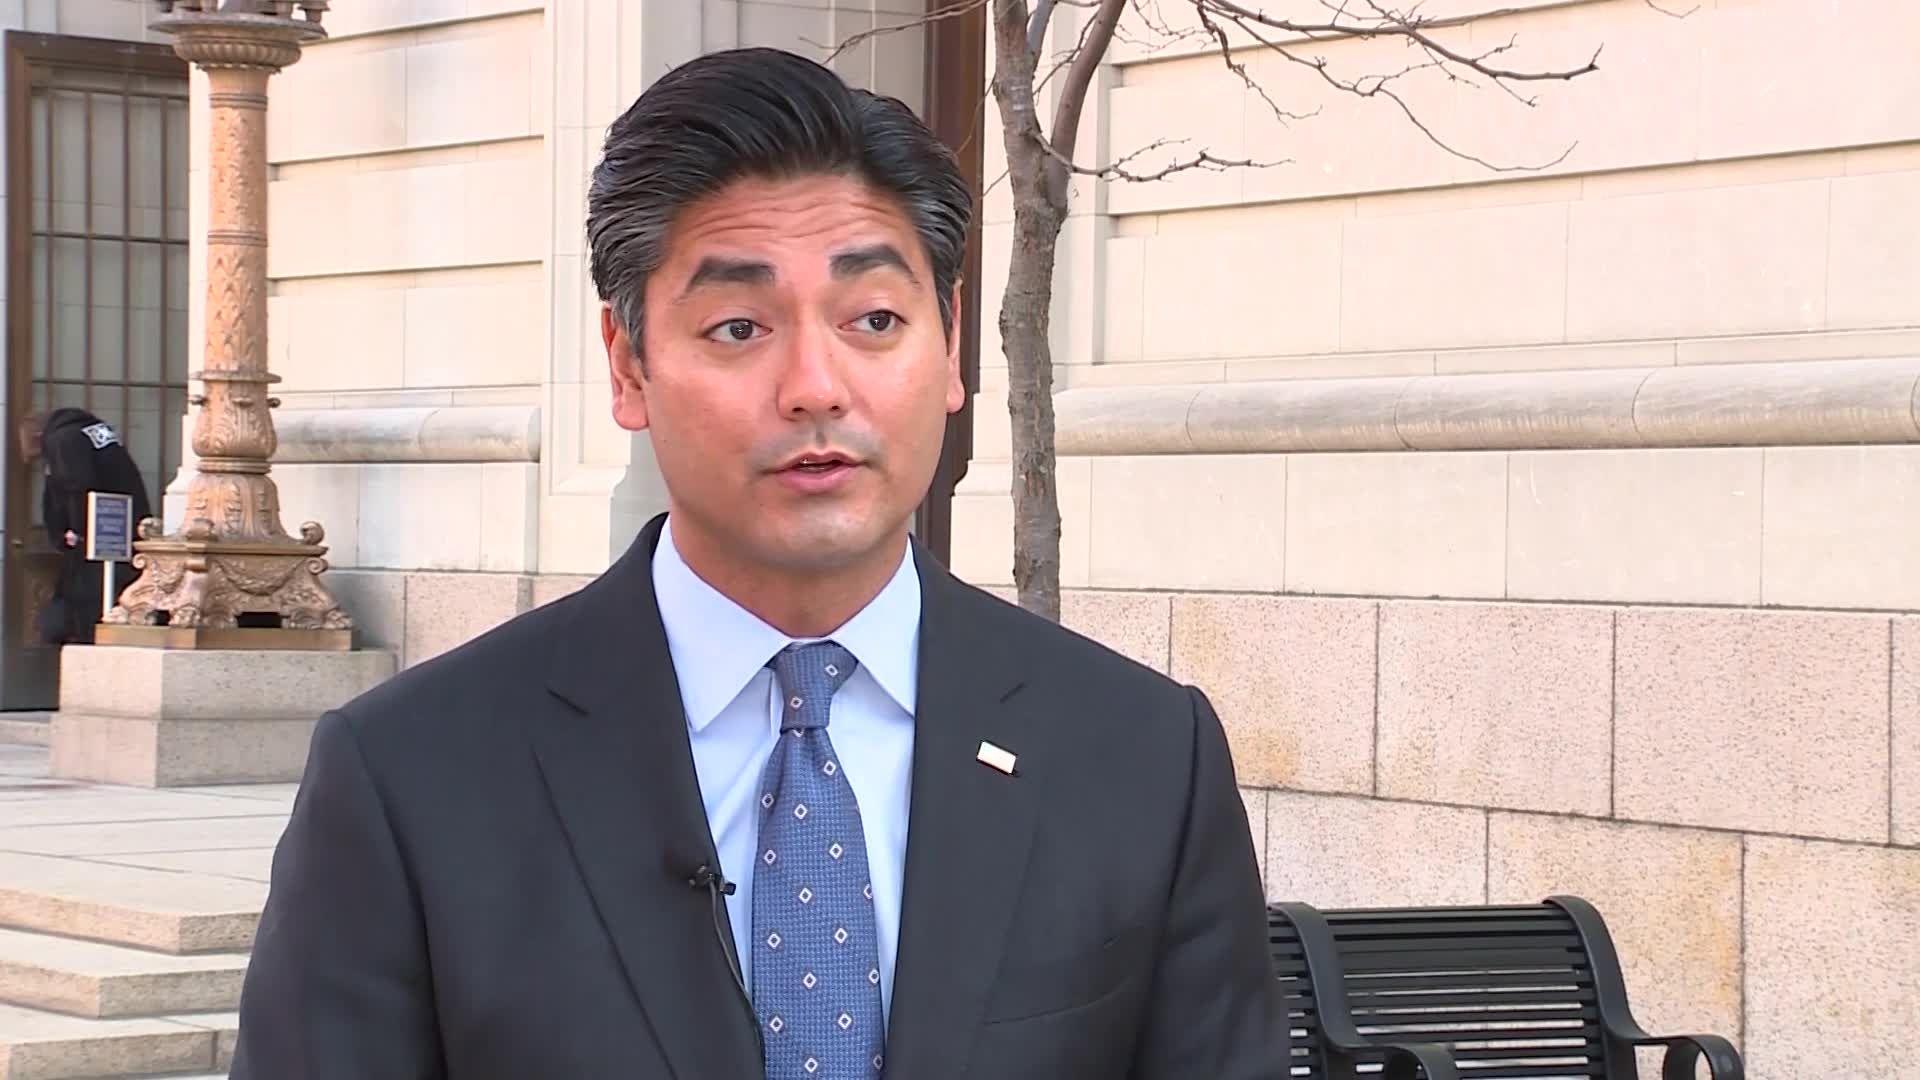 Aftab Pureval on why he should be Cincinnati's next mayor